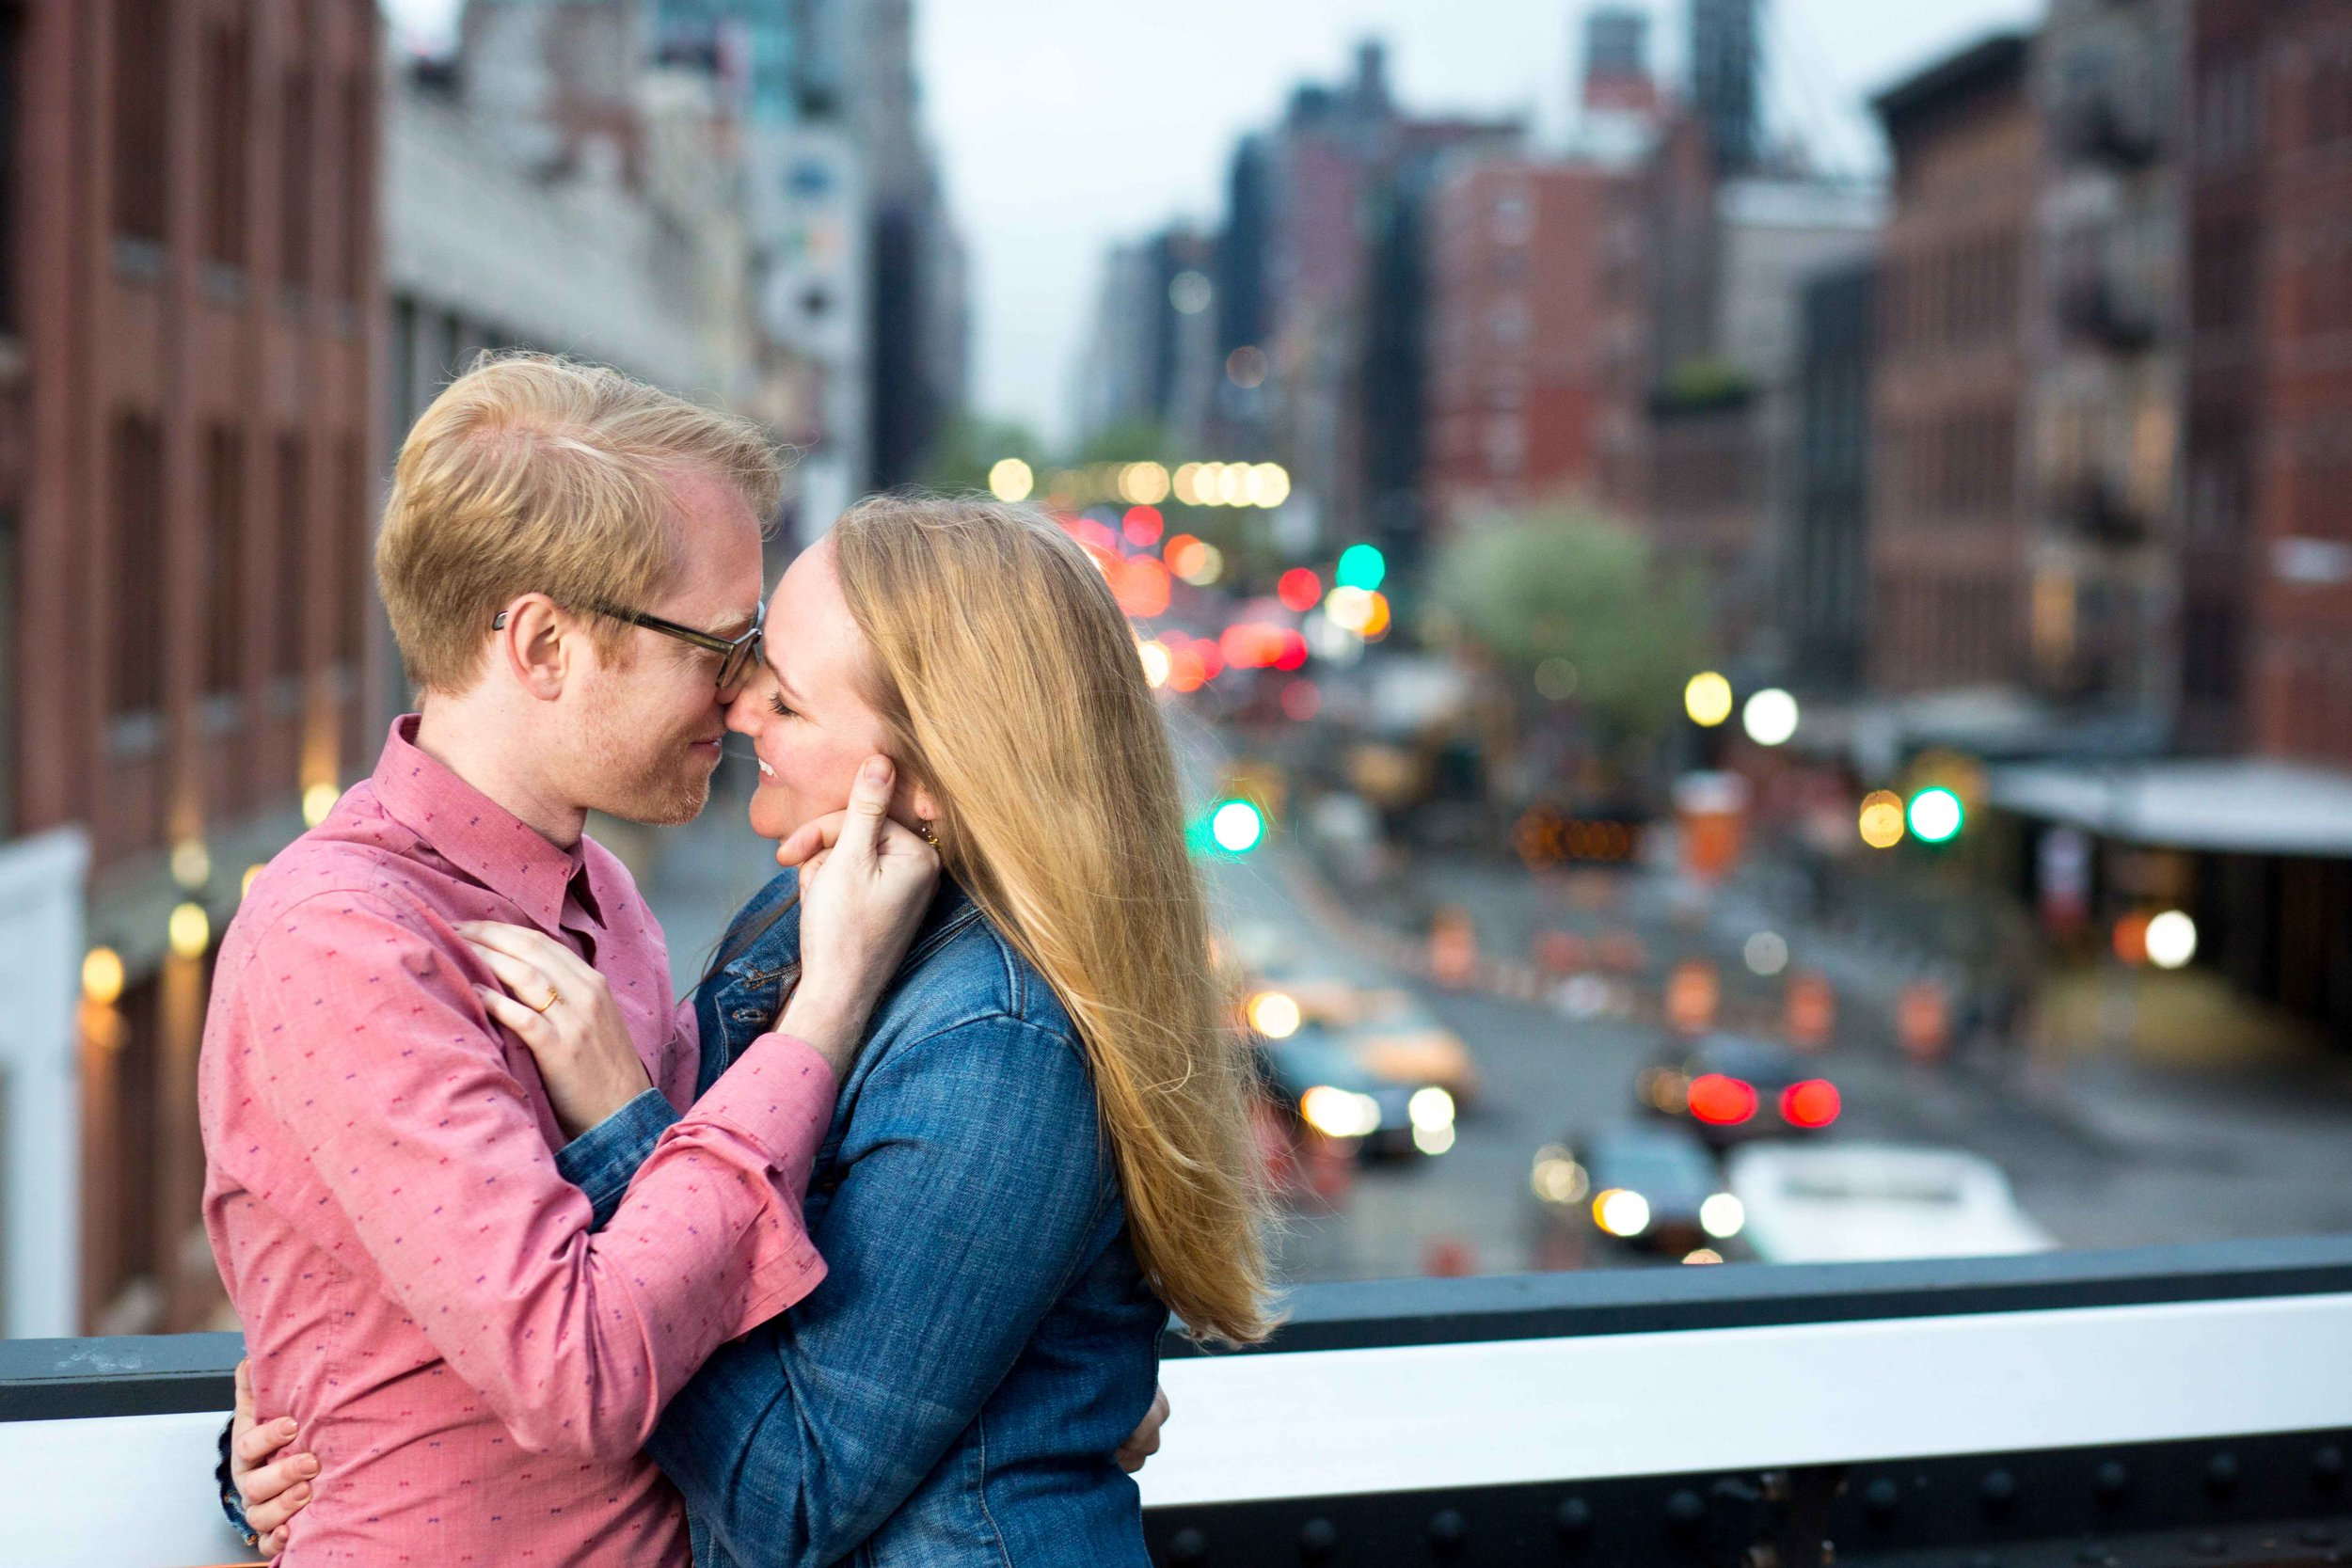 NYC High Line Highline Engagement Photo Shoot Session 2.jpg